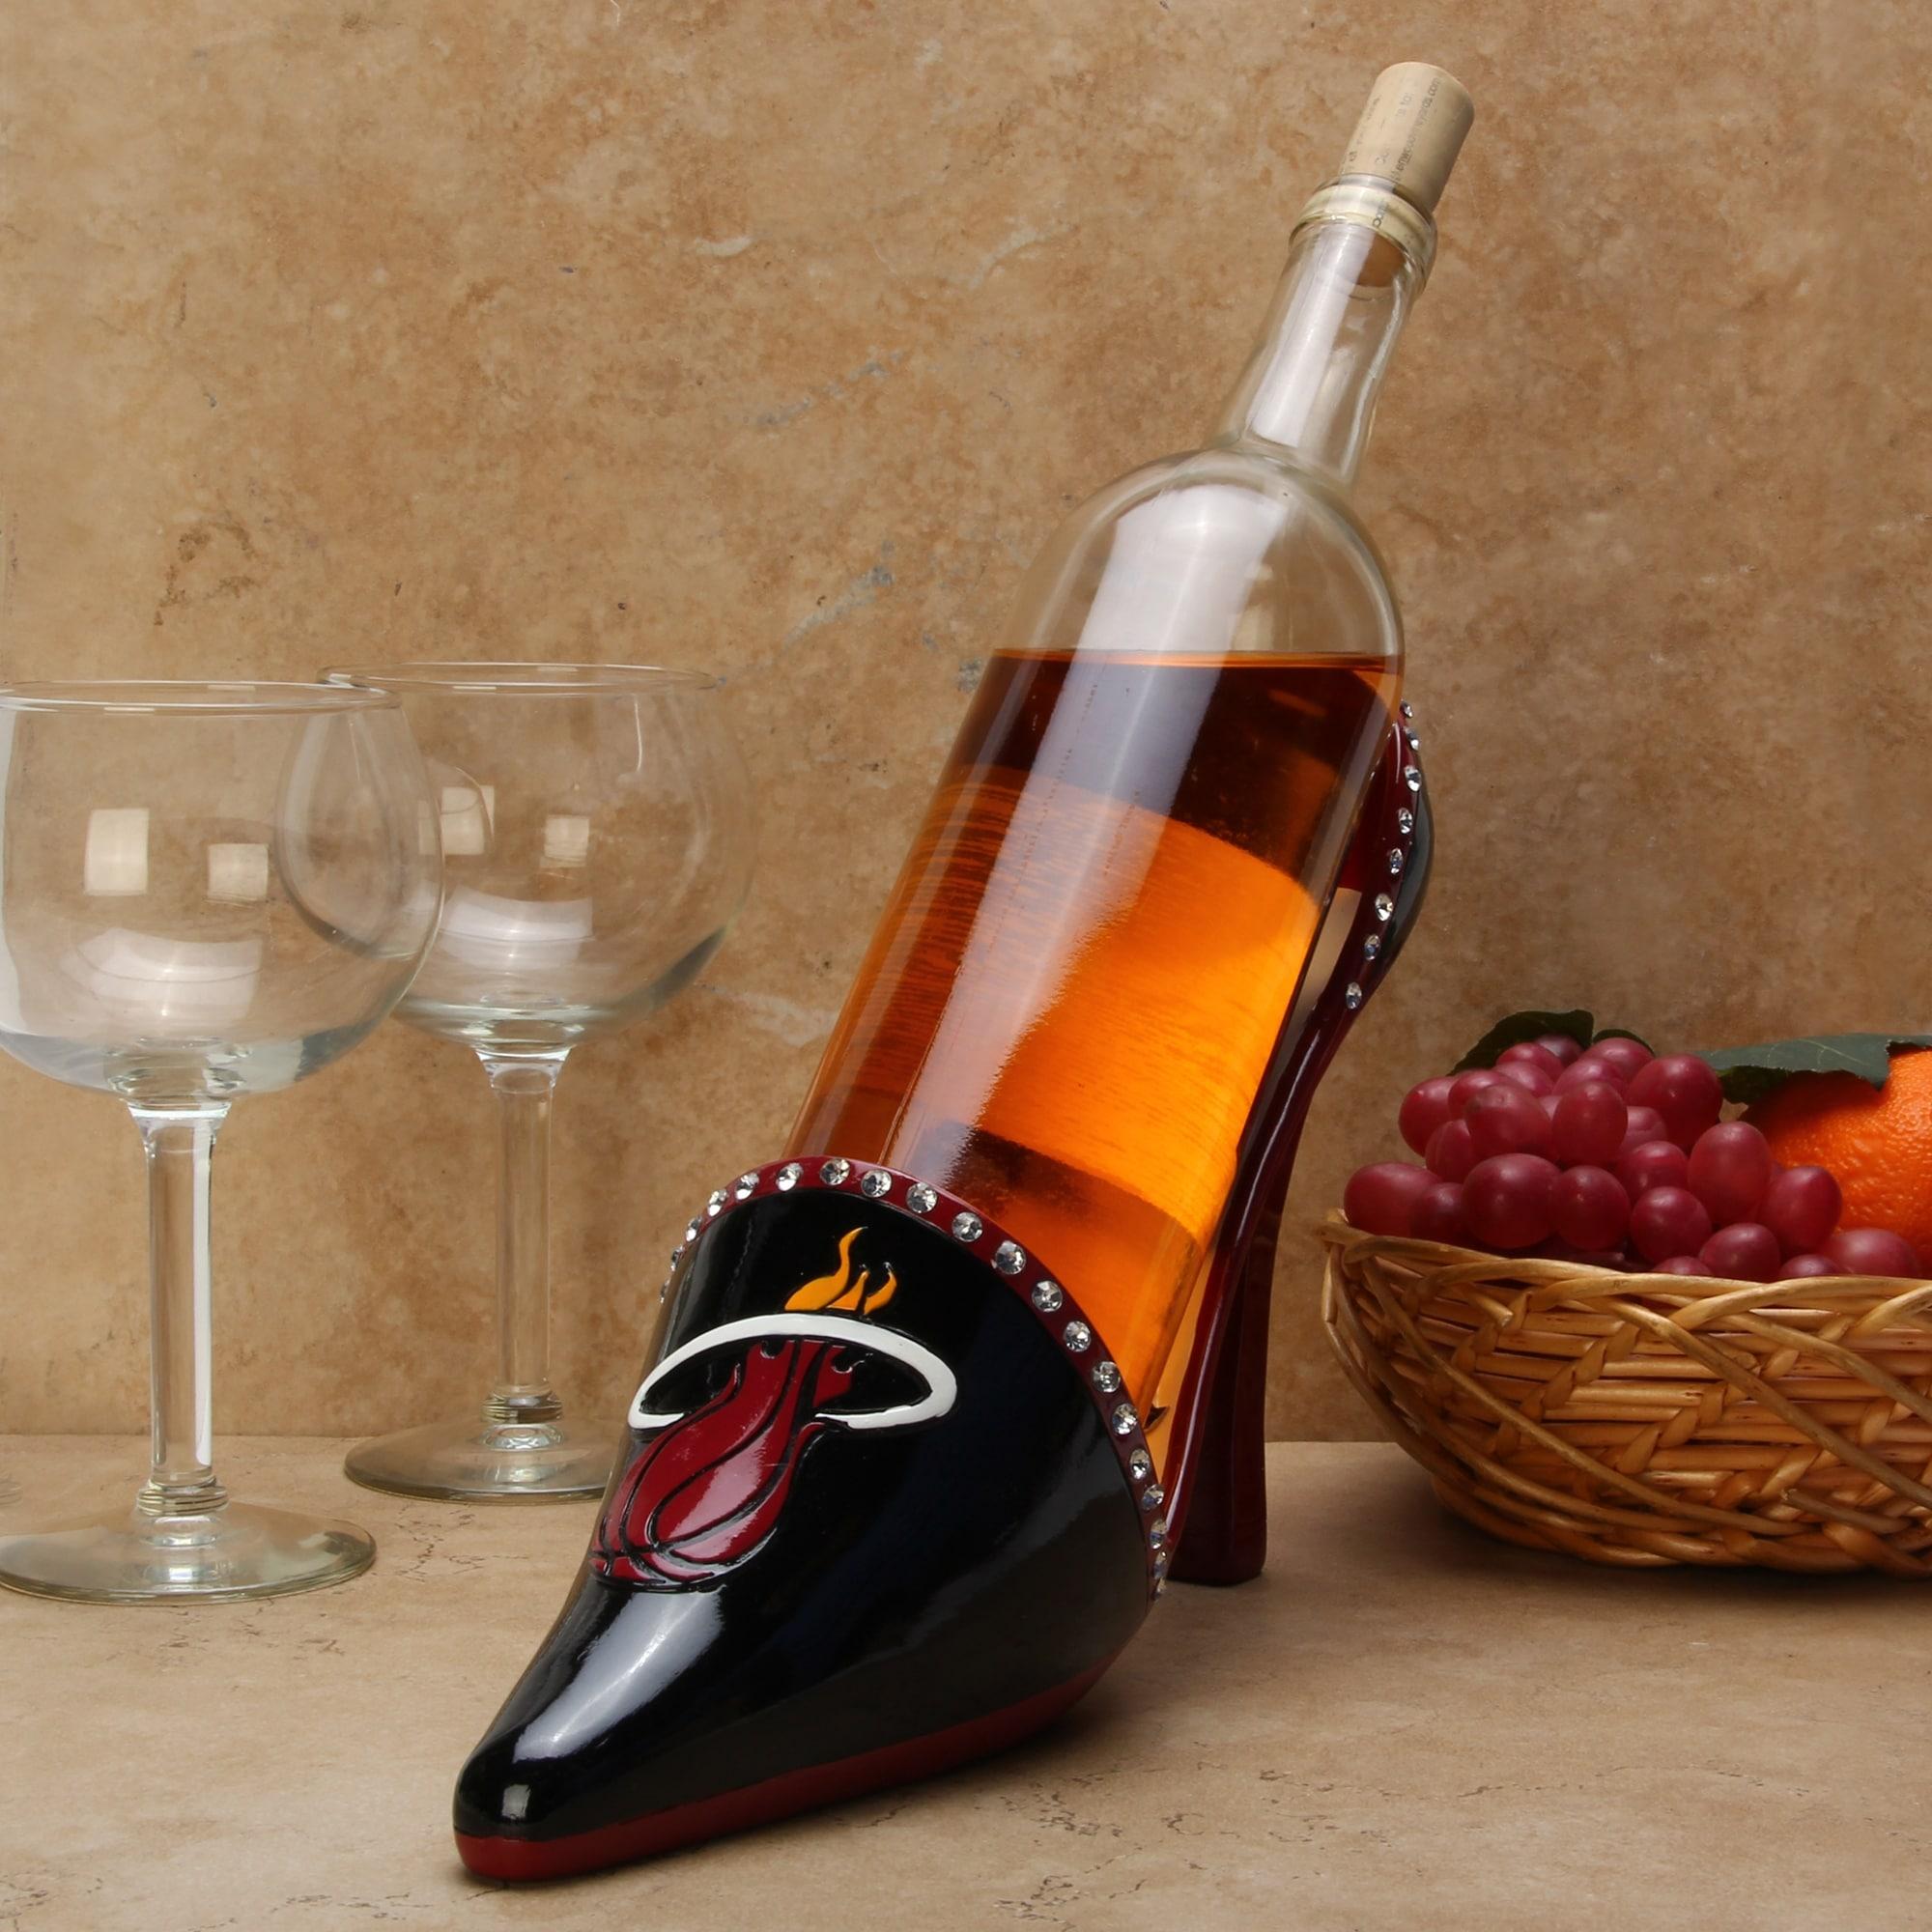 Miami Heat Shoe Wine Bottle Holder